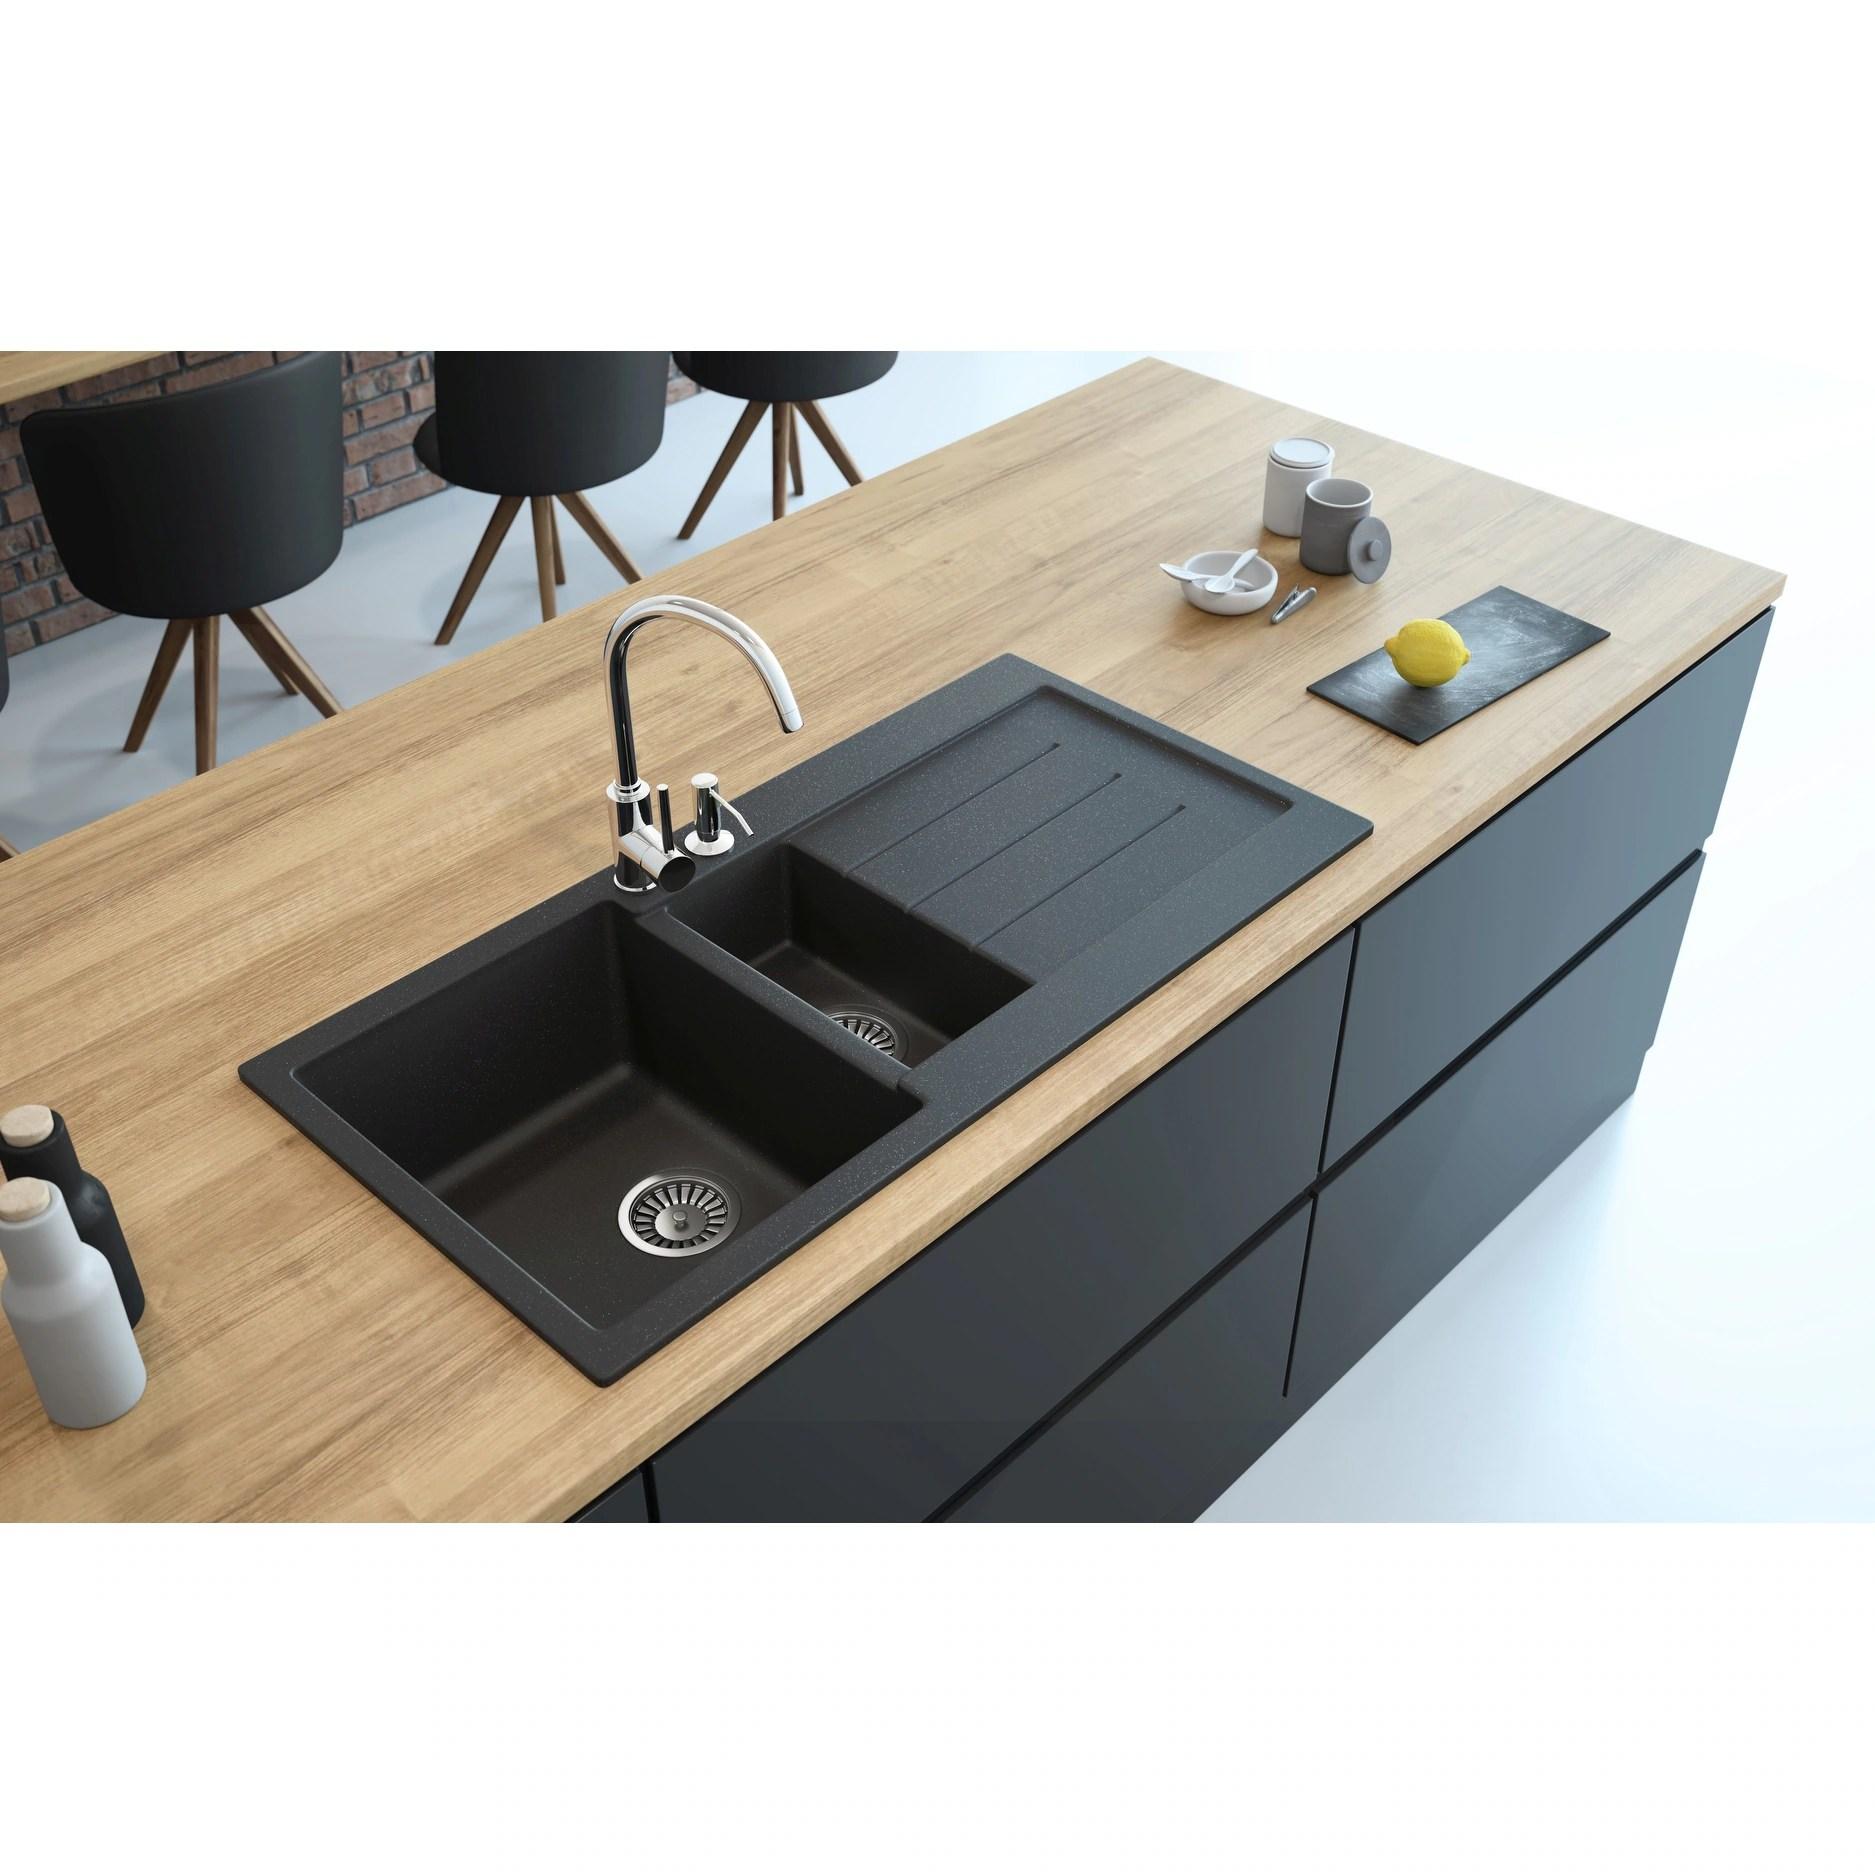 american lavello granite composite 39 drop in with drainboard double bowl kitchen sink marcello right 3 holes